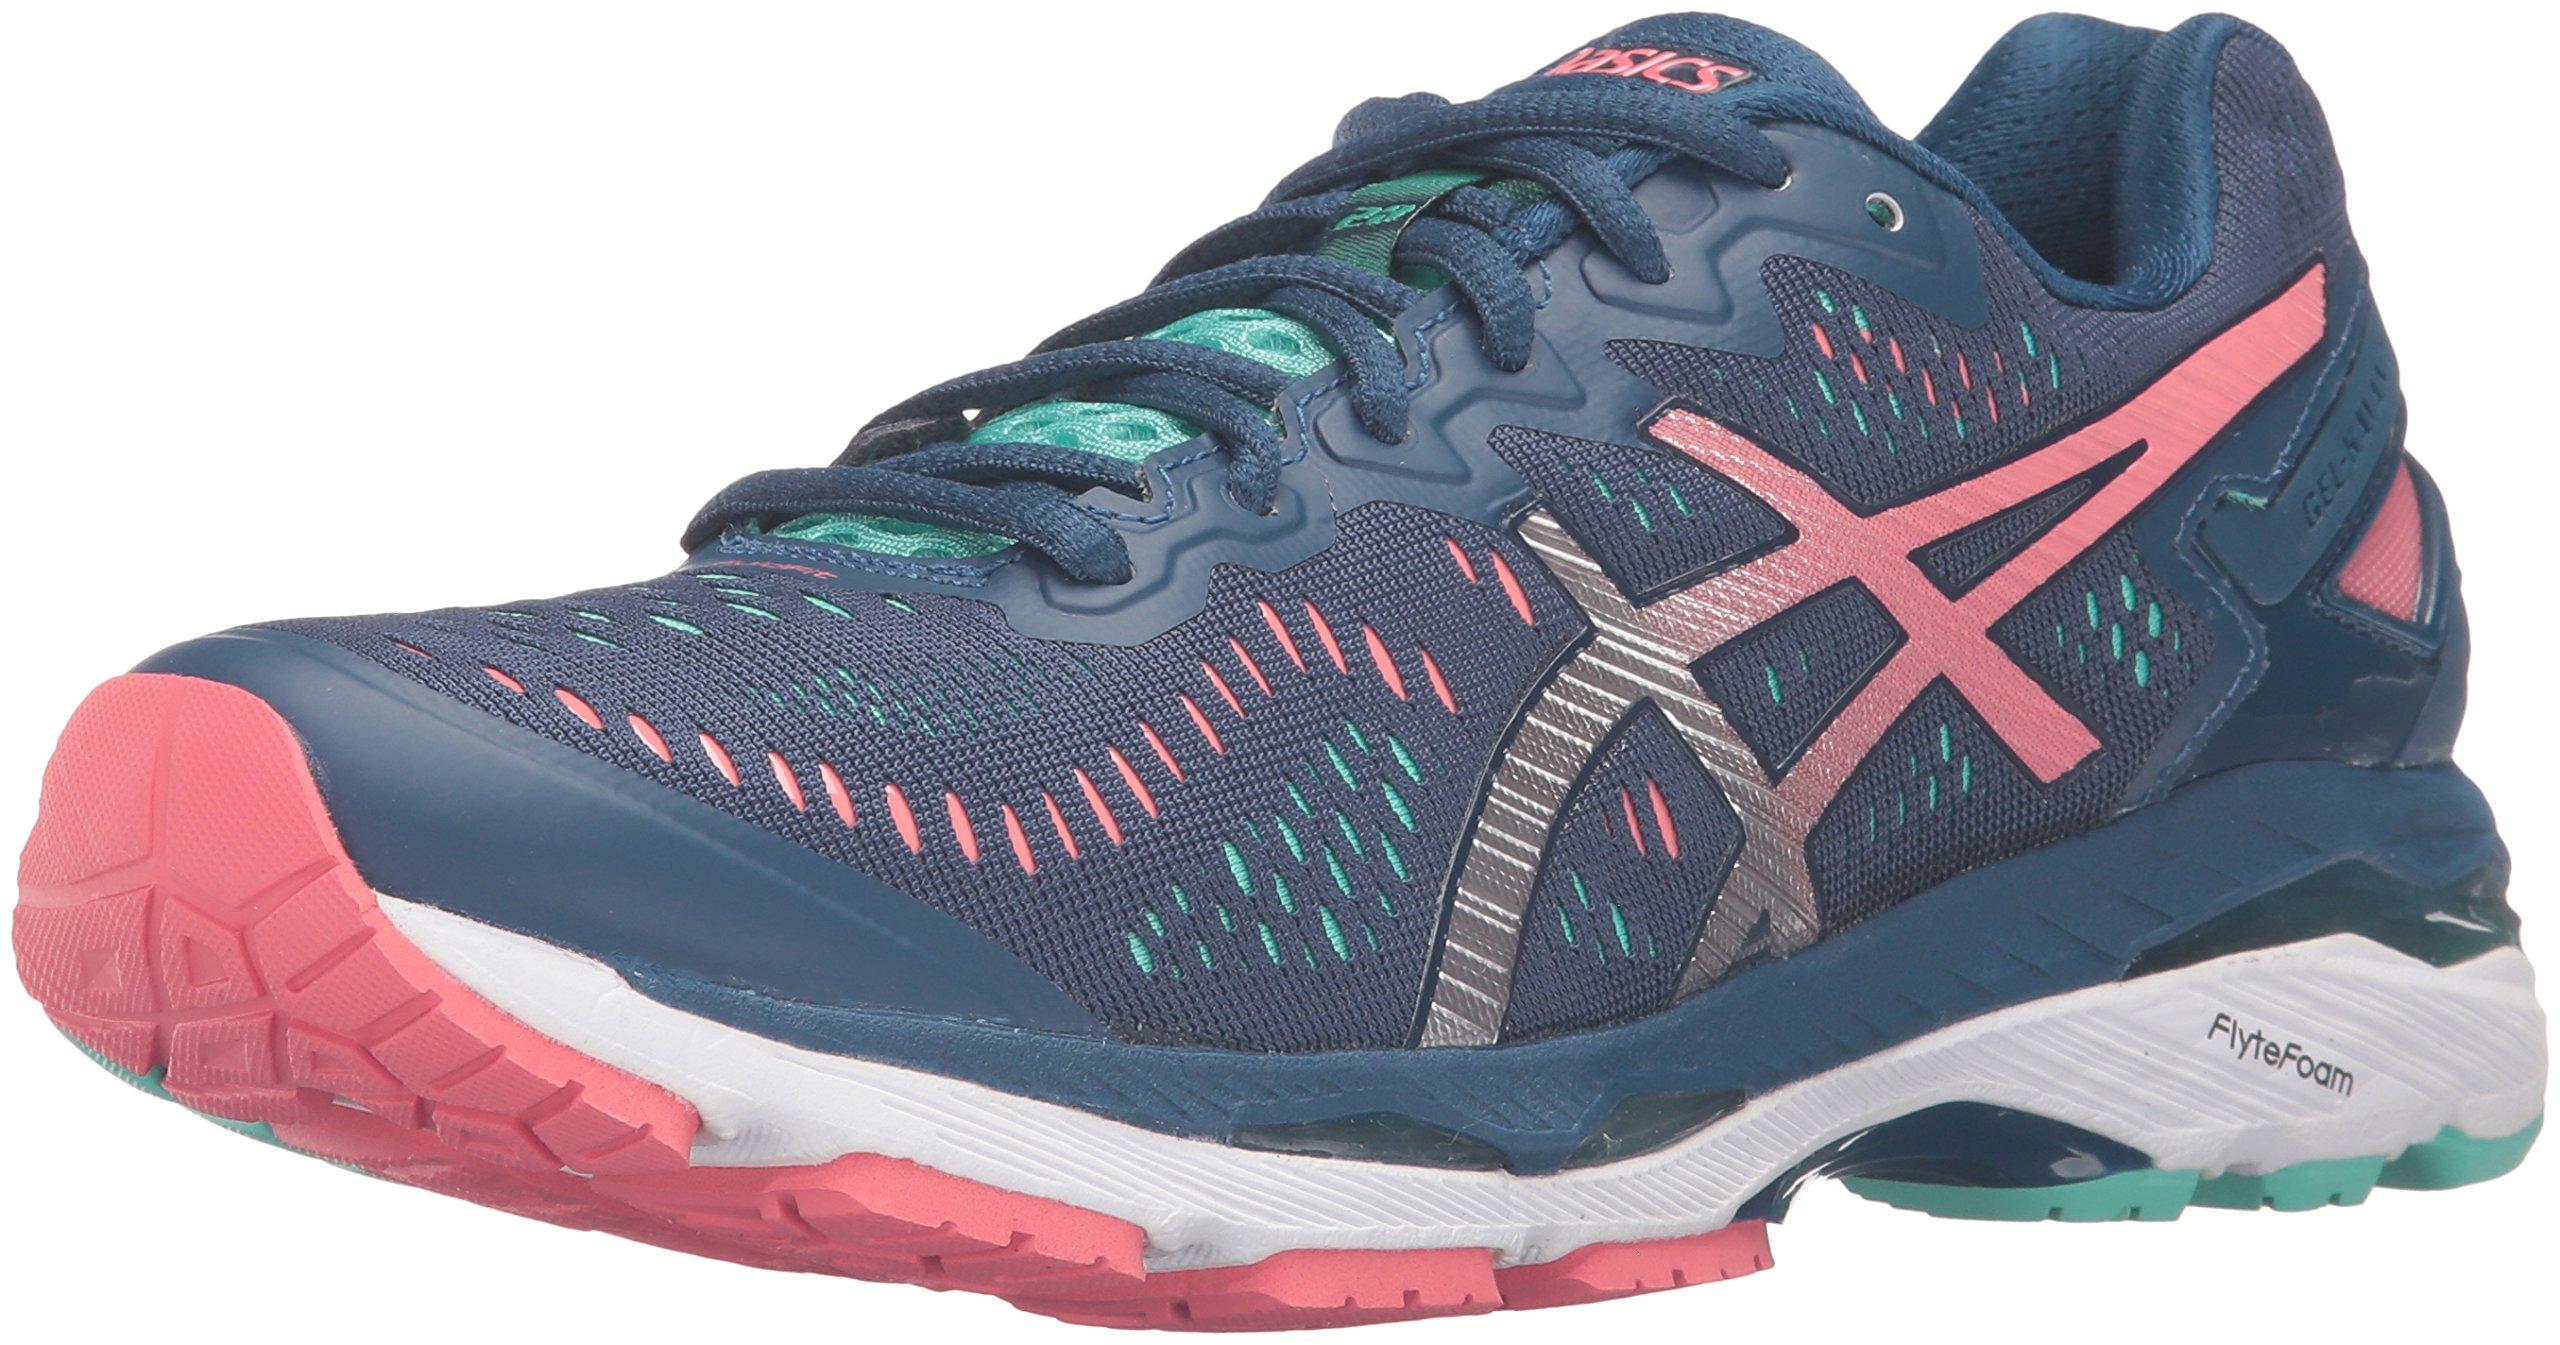 ASICS Women's Gel-Kayano 23 Running Shoe, Poseidon/Silver/Cockatoo, 8 M US